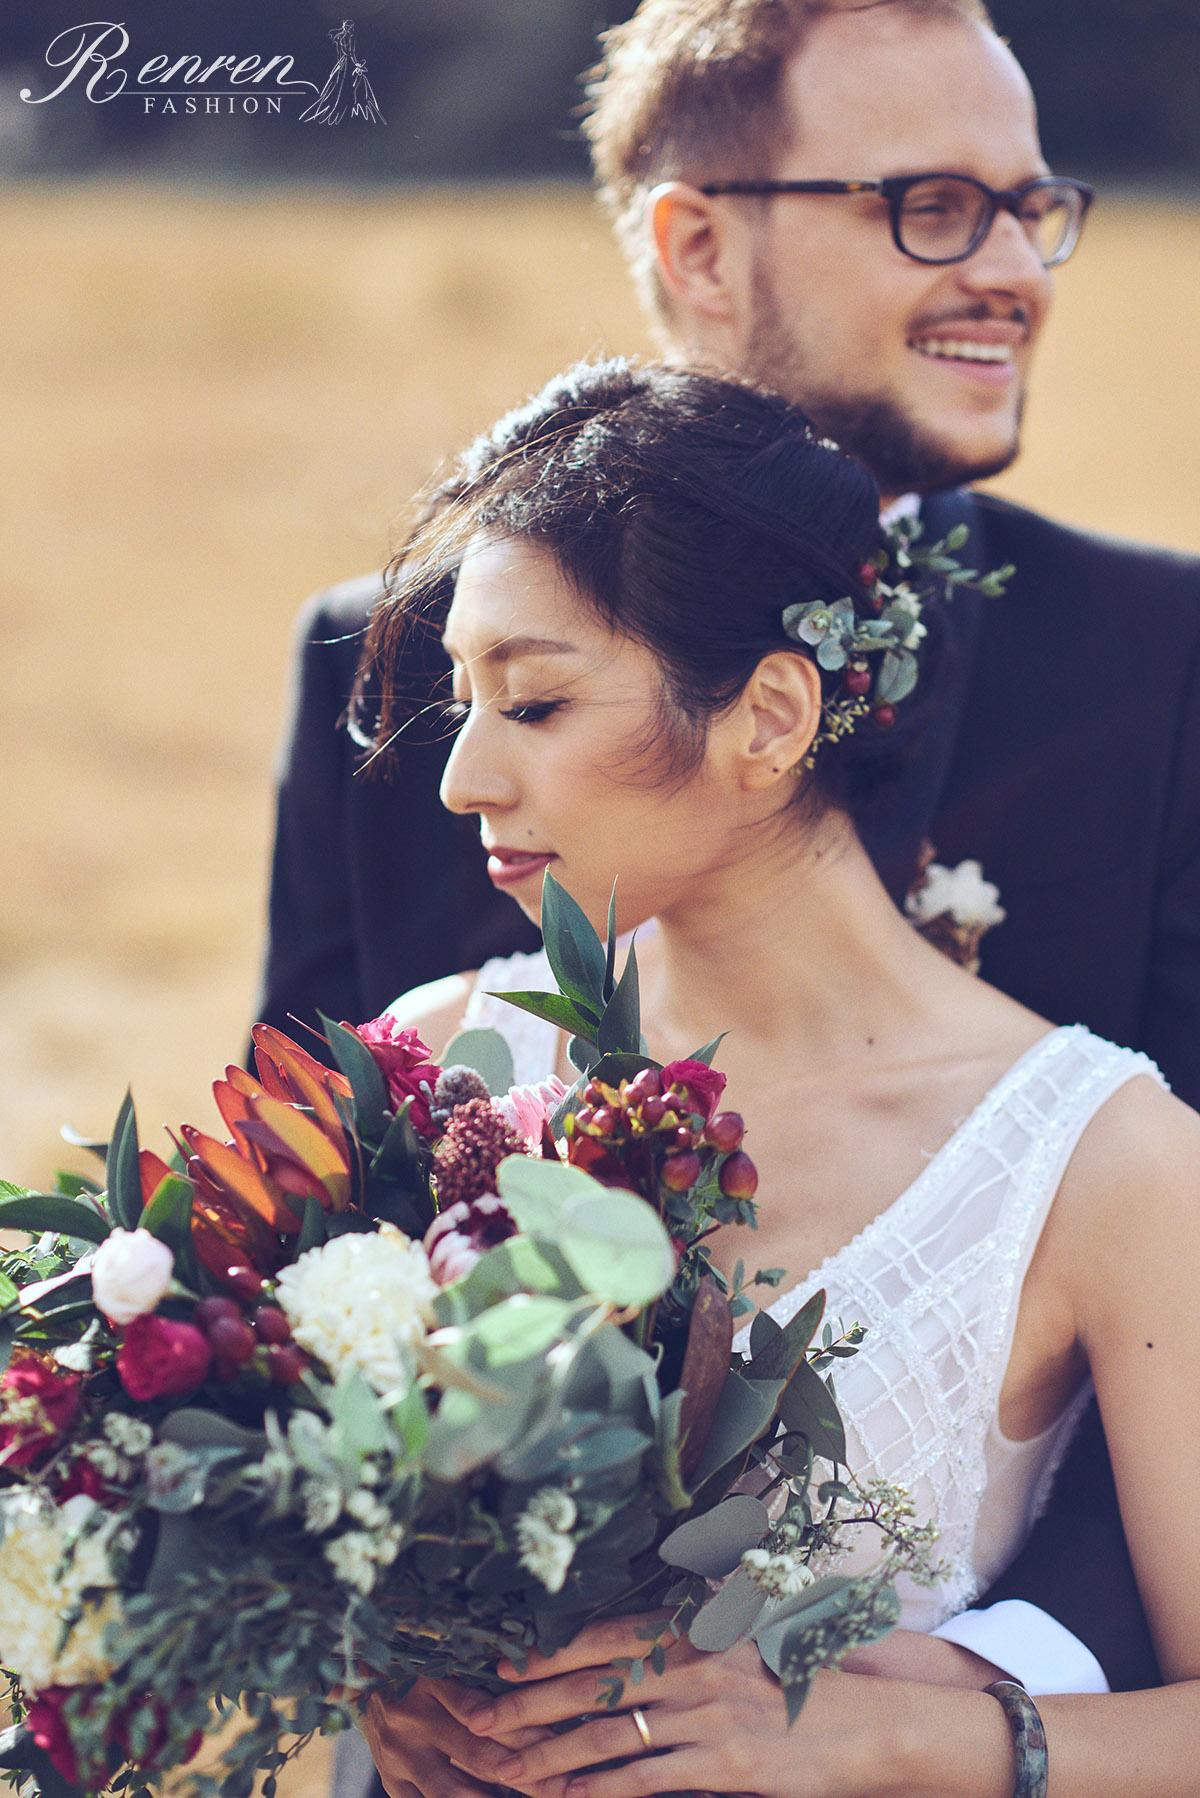 RenRenBridal-冉冉婚紗-MUNDO慕朵影像-StylistMei-美式婚紗-04